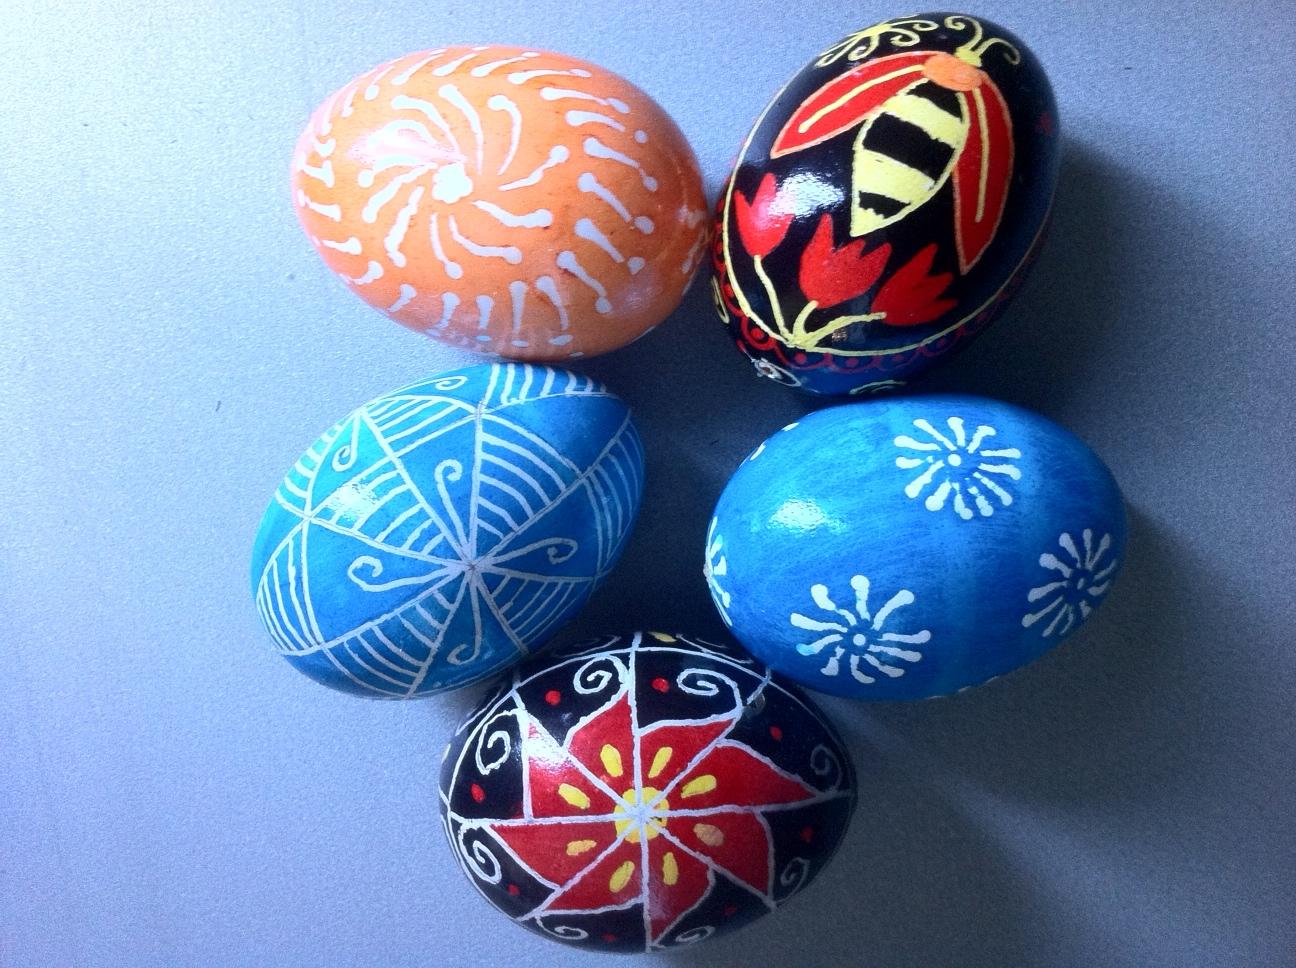 Egg Ceremony